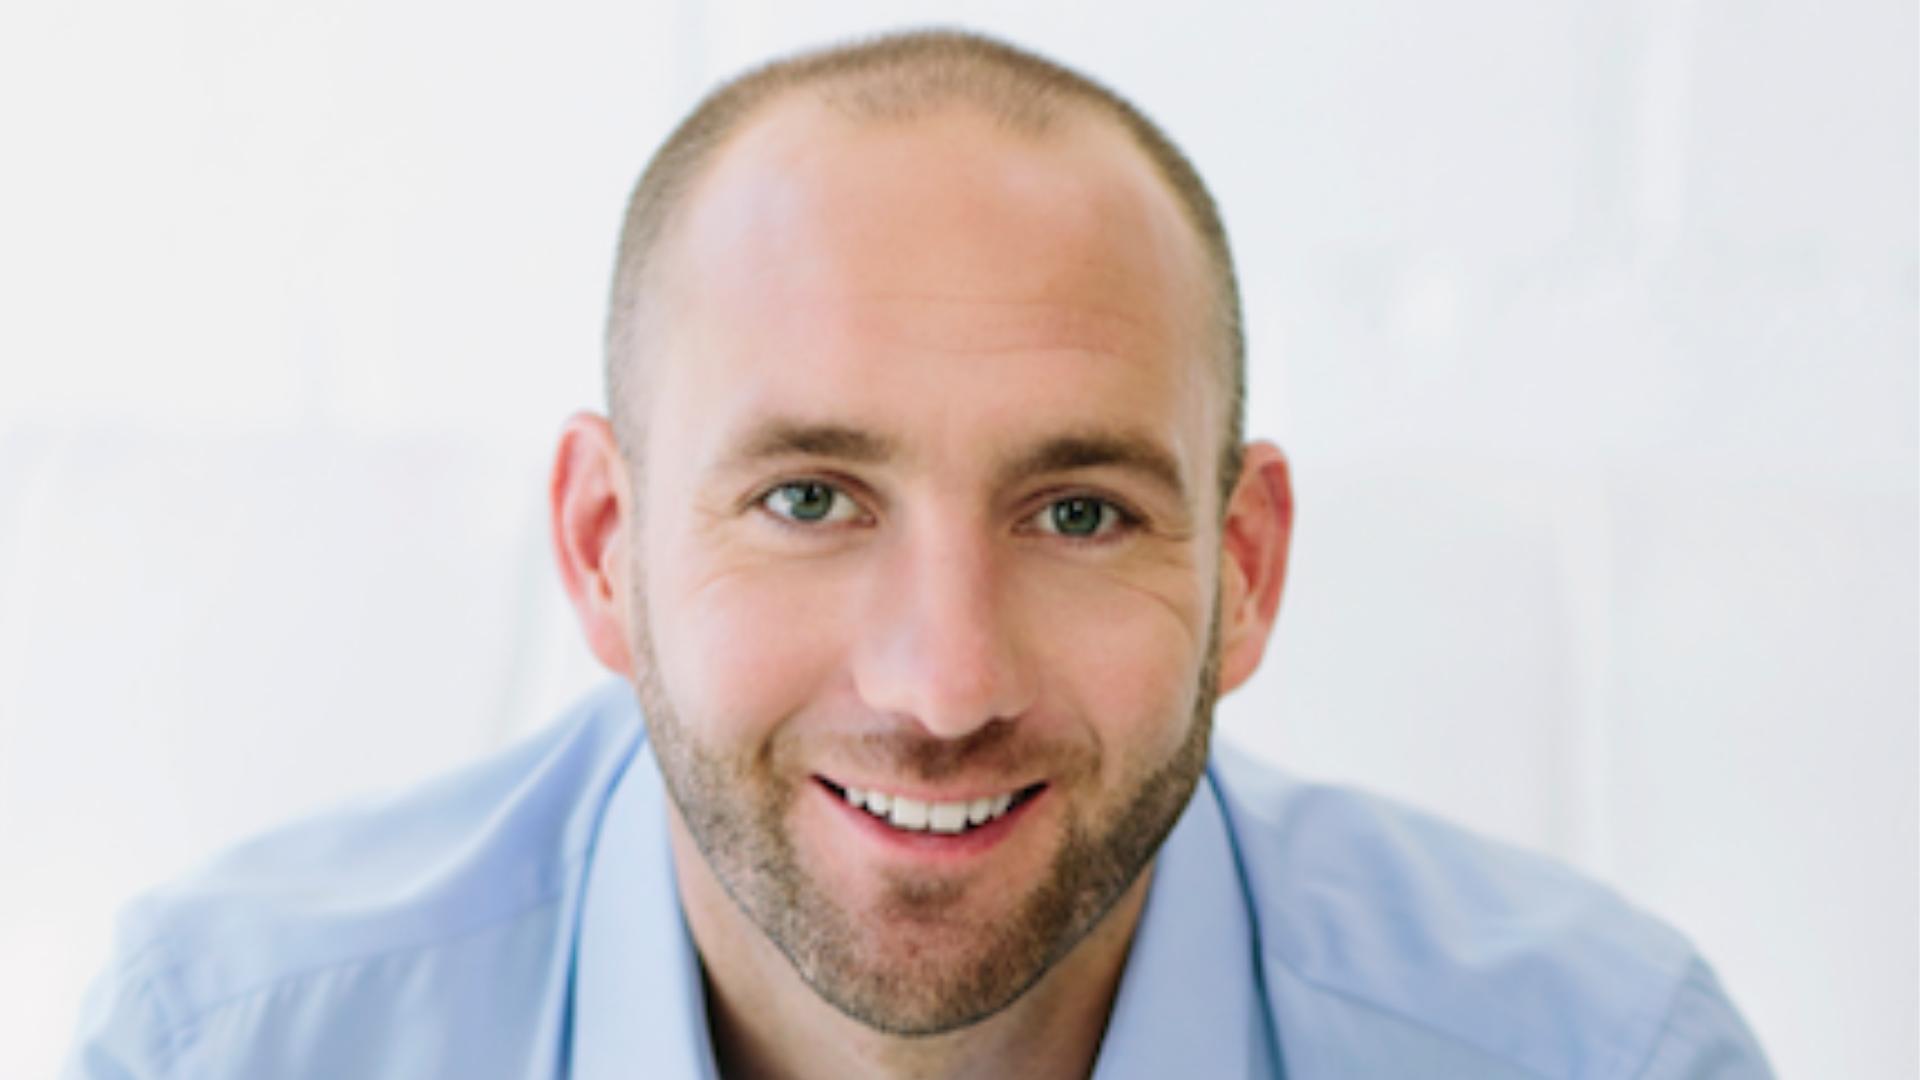 Next Expert on Bazaar's Virtual Retreat: Blake Sergeant